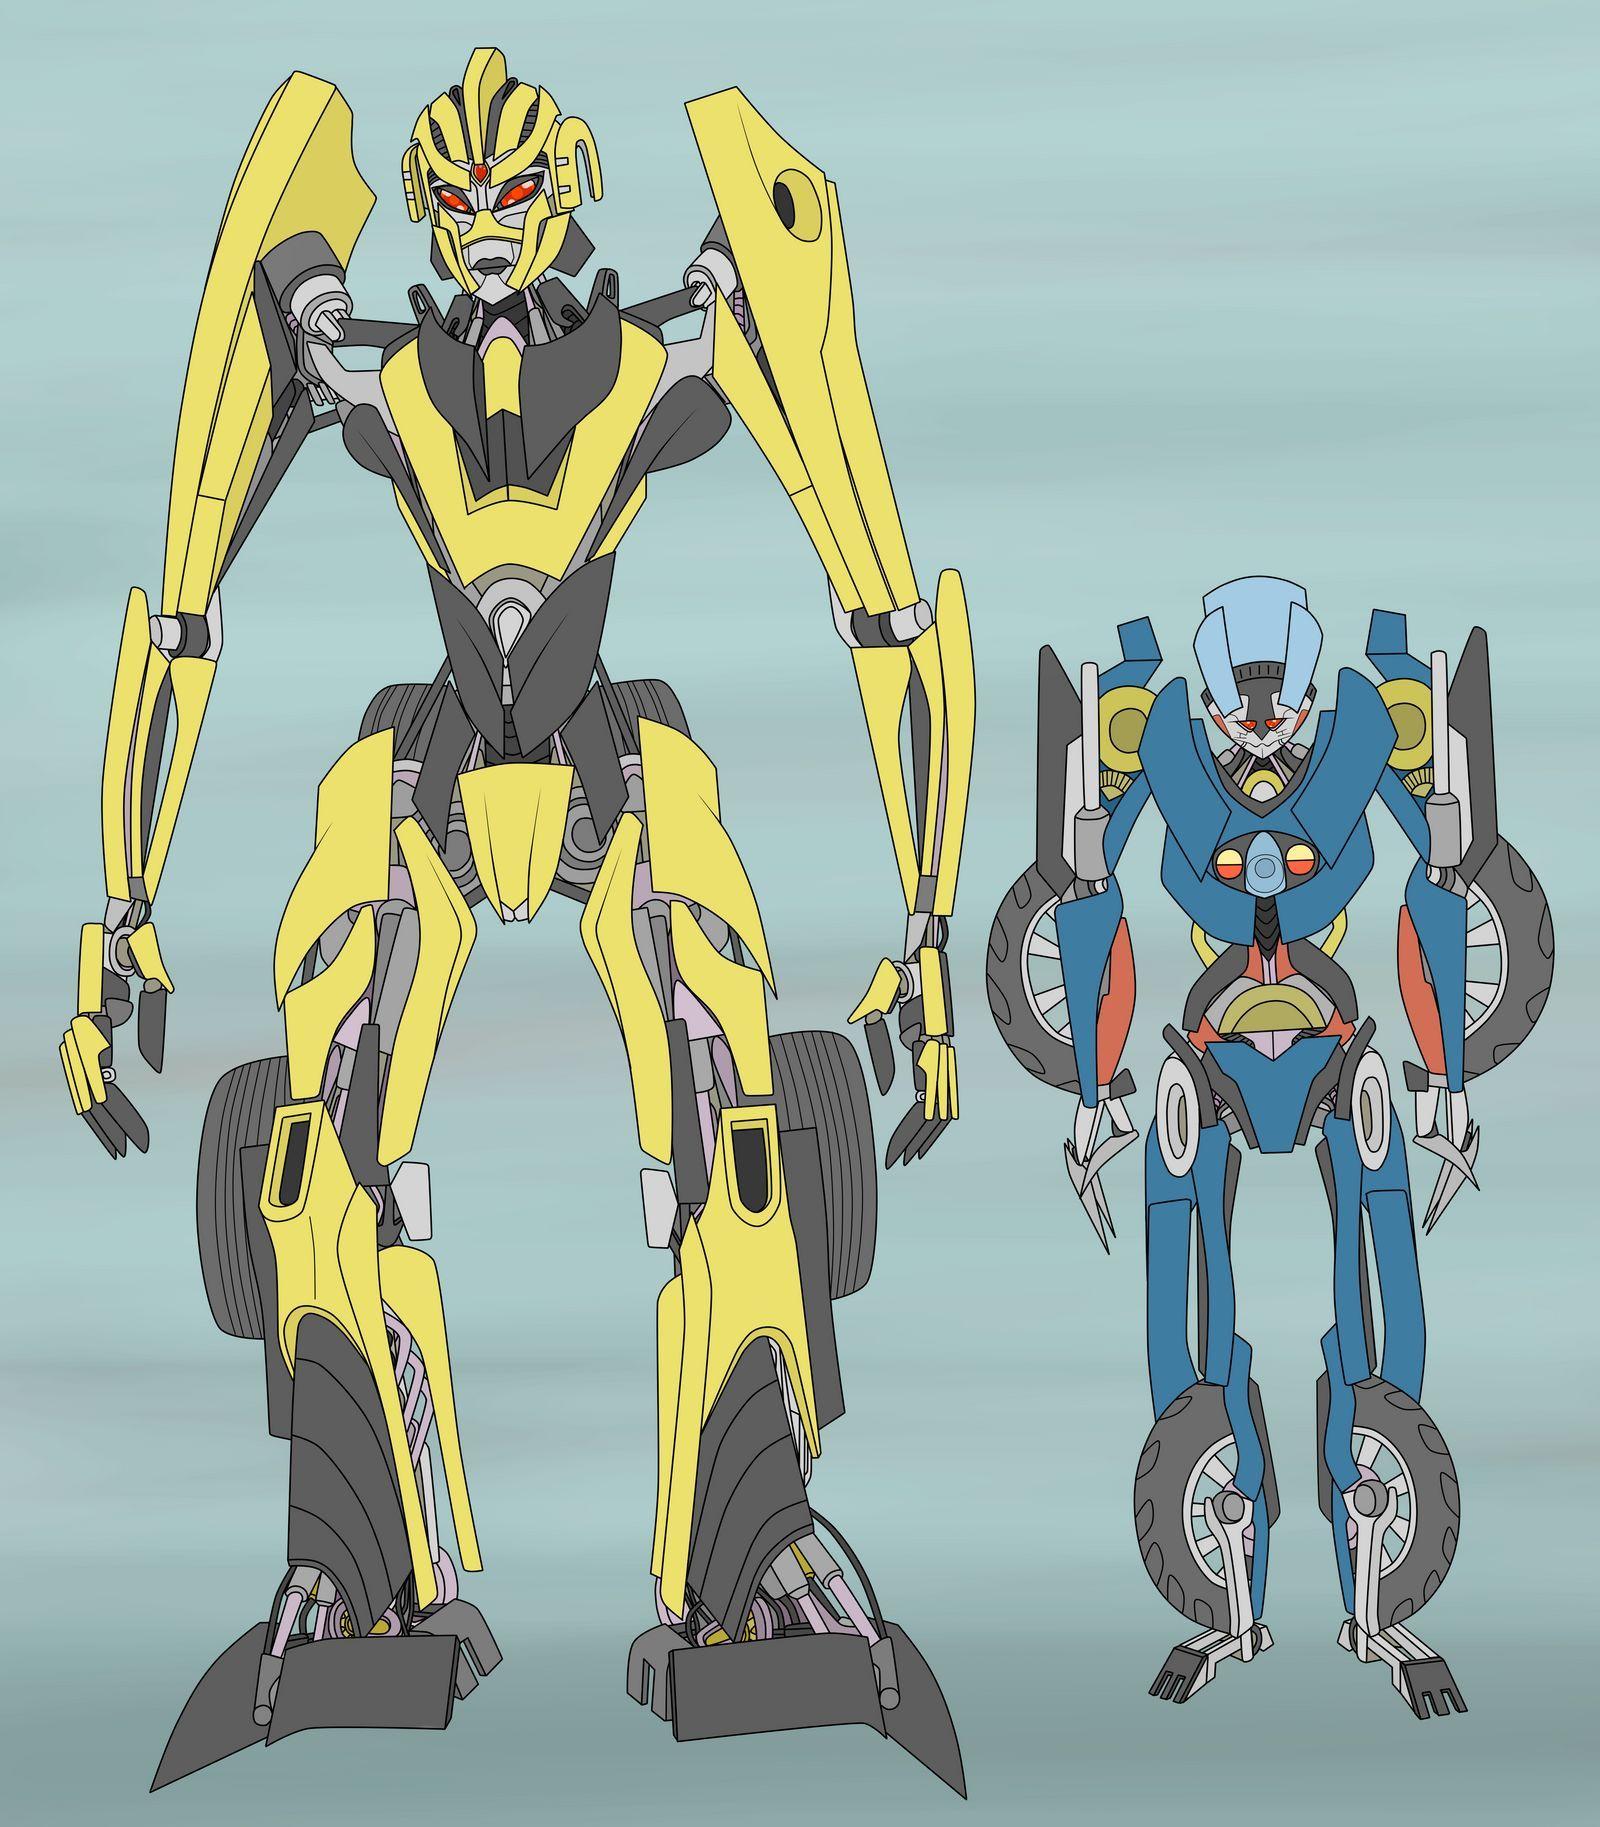 Stunticon Dragstrip And Ped By Destallano4 On Deviantart Deviantart Samurai Transformers